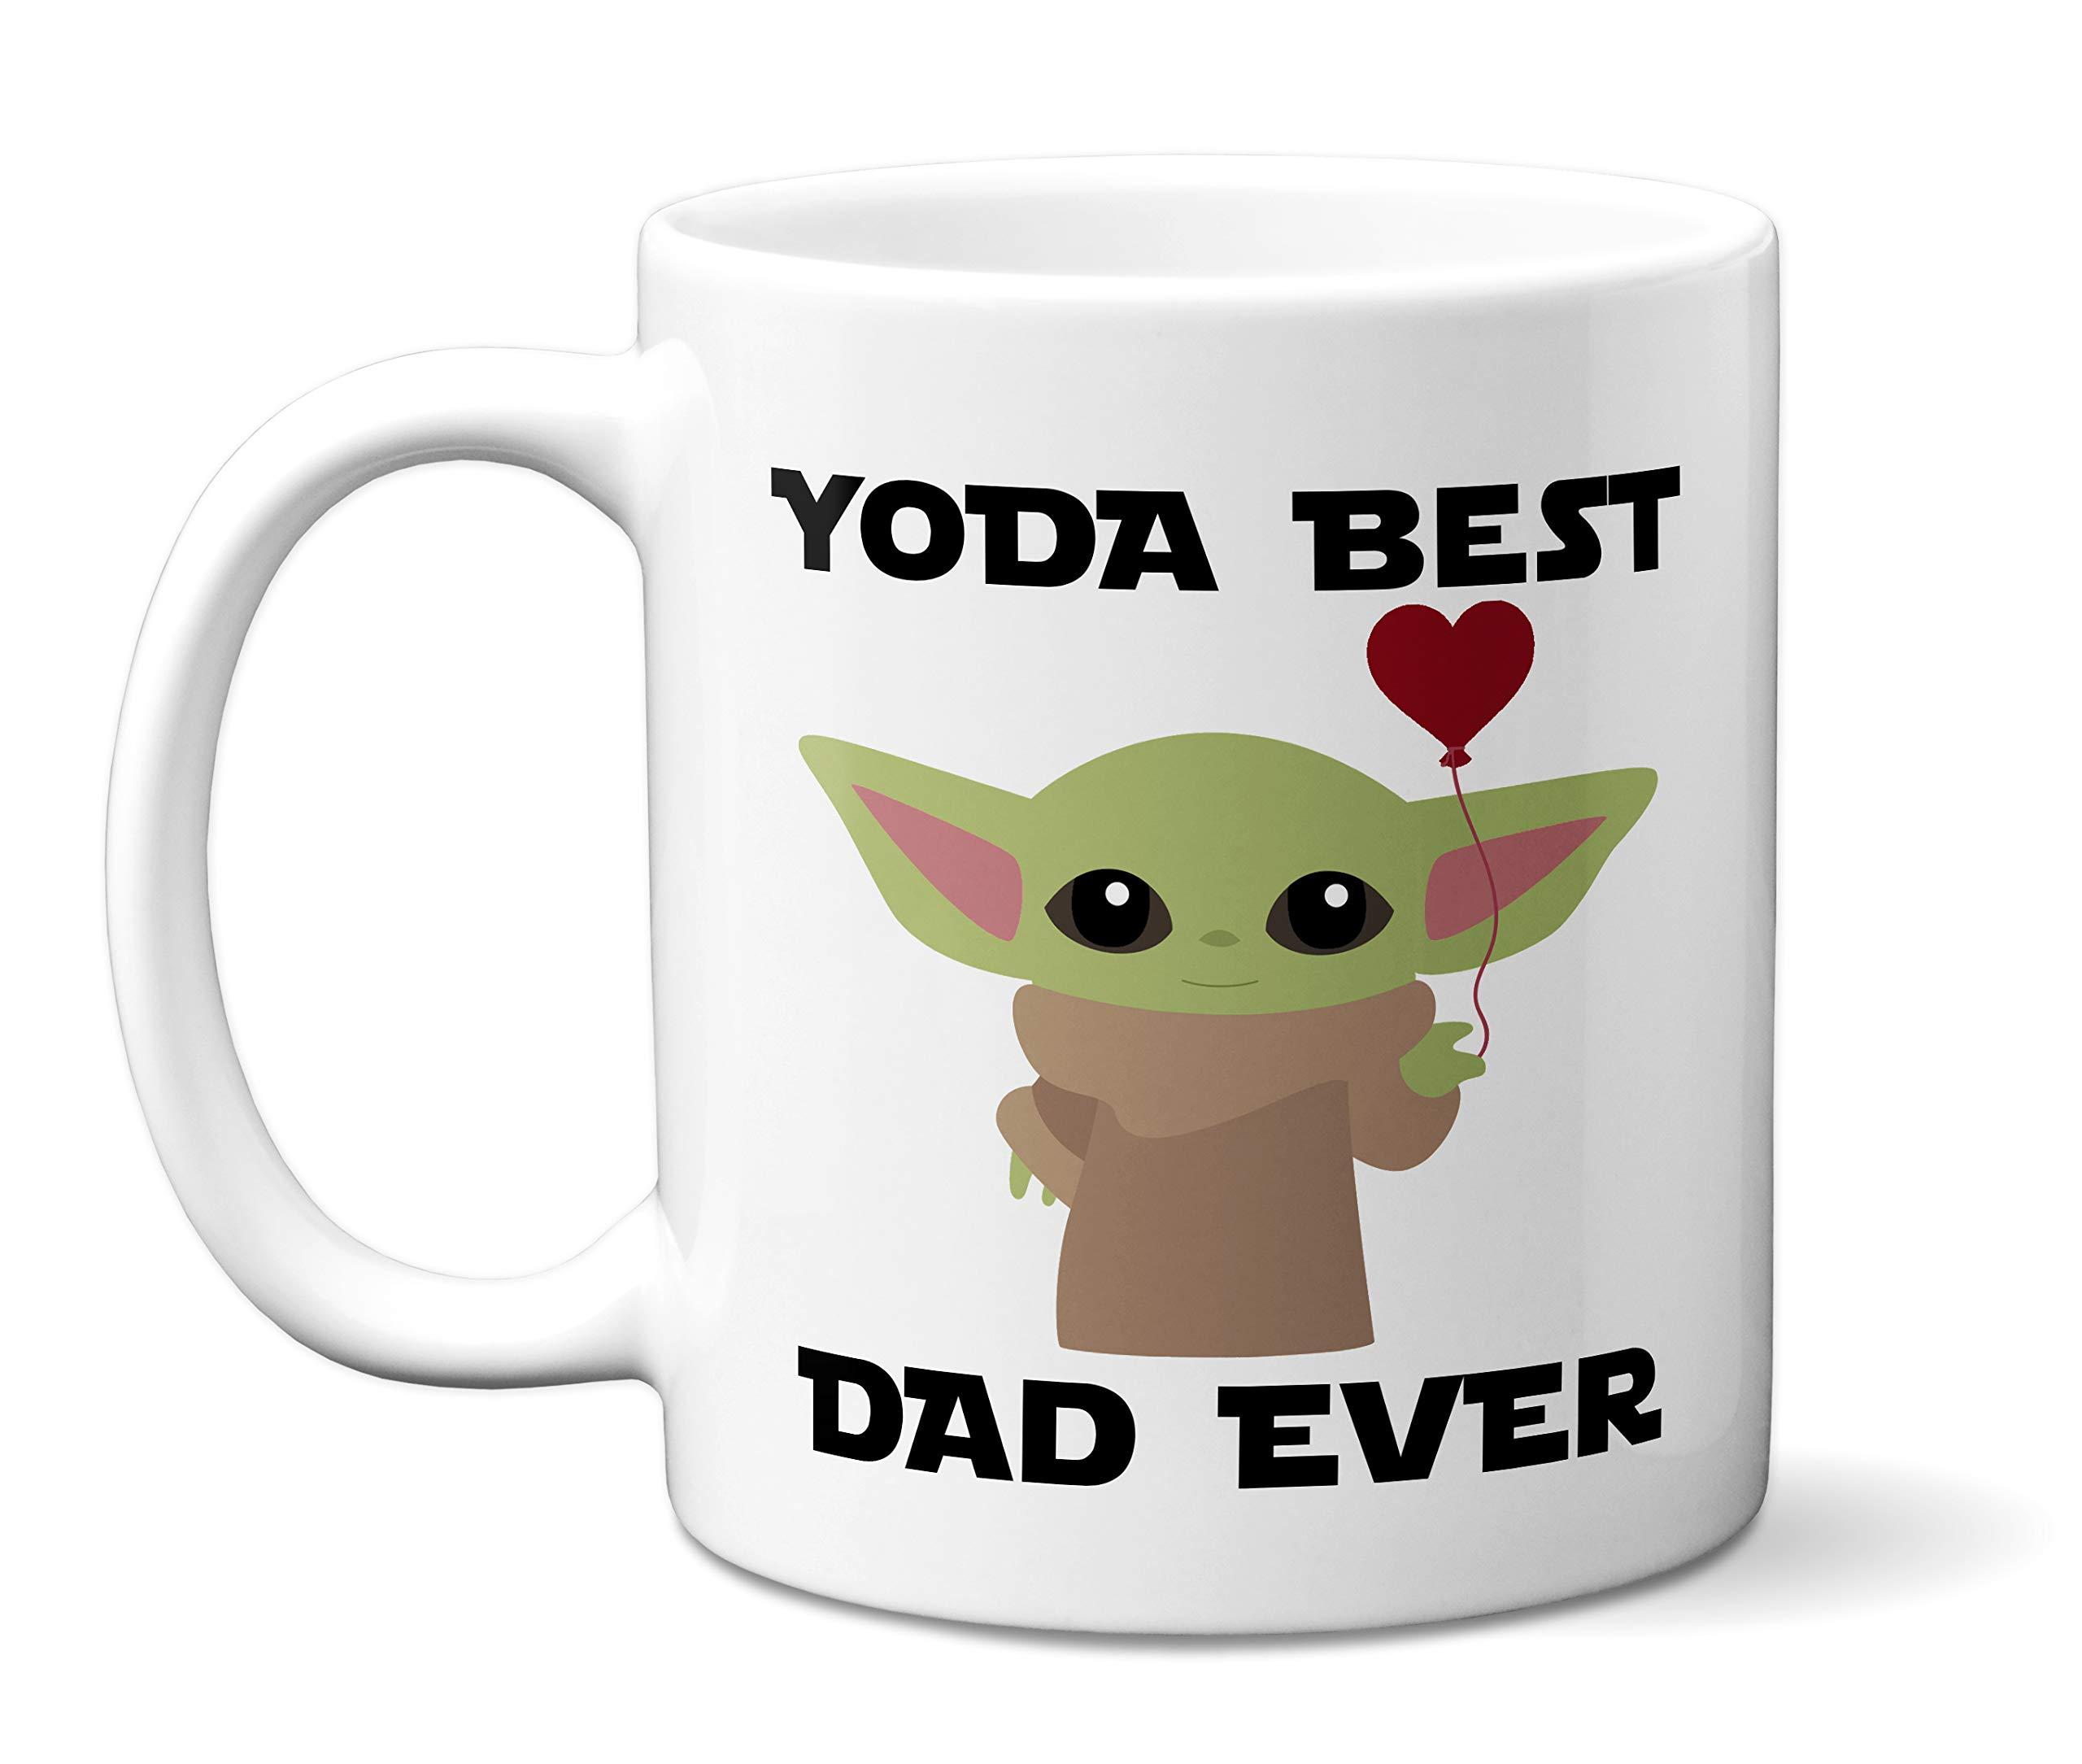 Cool mug Per Novelty mug Star wars yoda best dad ever mug Funny mug Ceramic